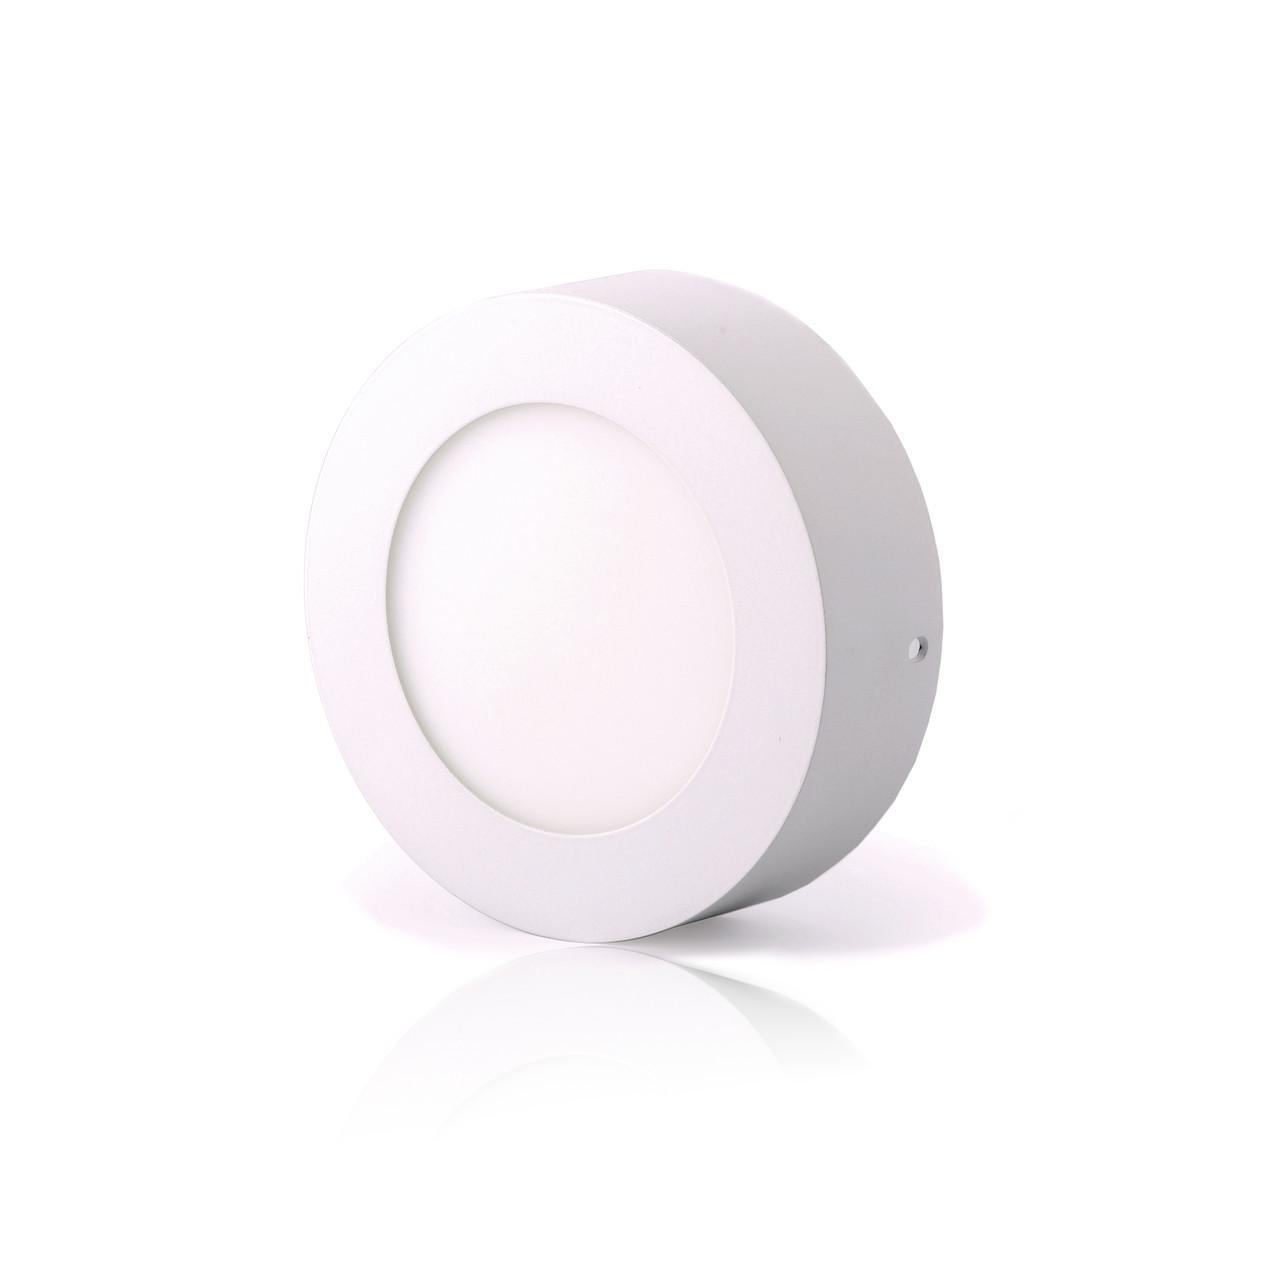 LED Downlight Евросвет 6Вт 6400К накладной круг LED-SR-120-6 000039174